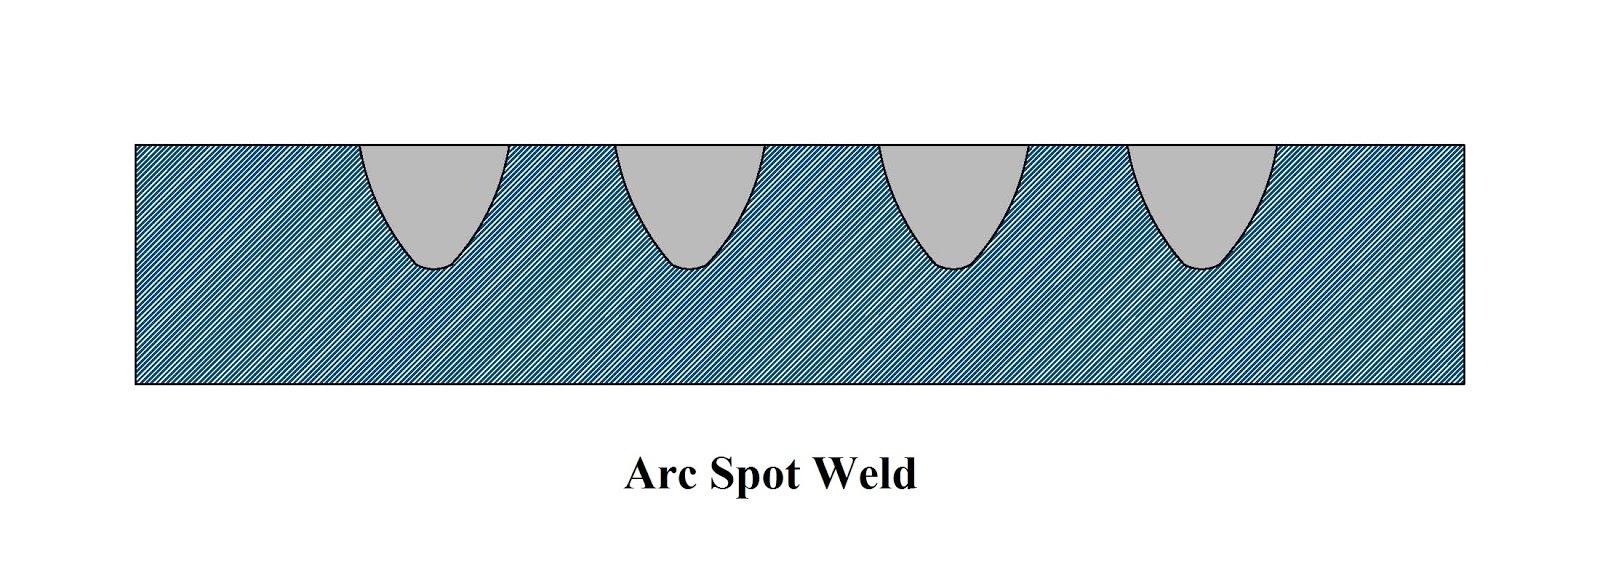 Different Types of Welds in Welding Process | Welding , Hardfacing ...